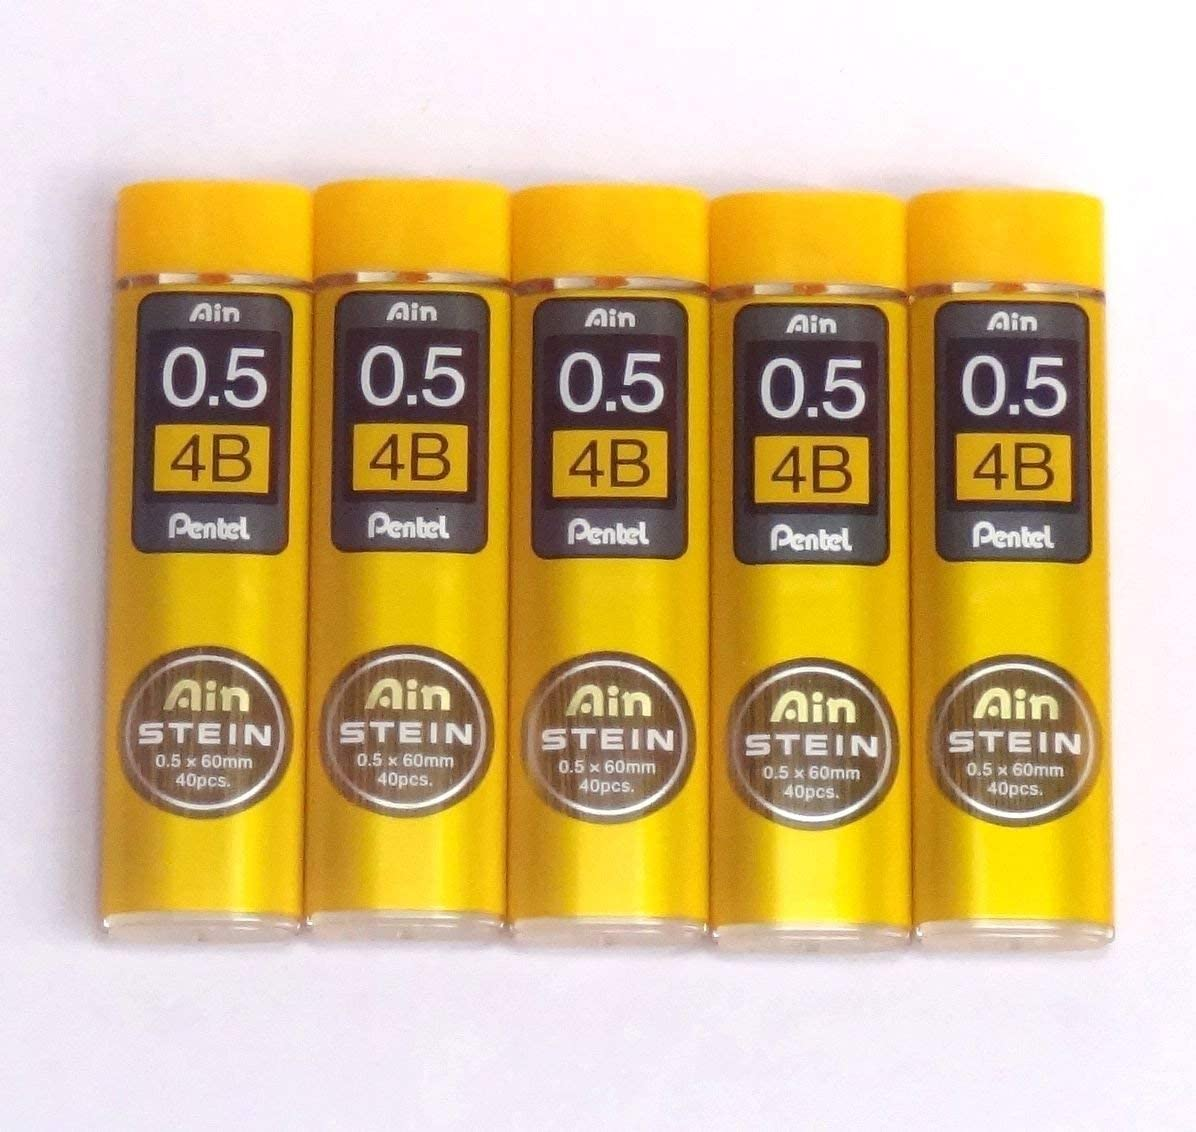 Pentel Ain Stein C275-4B 0.5mm Refill Leads 5tubes